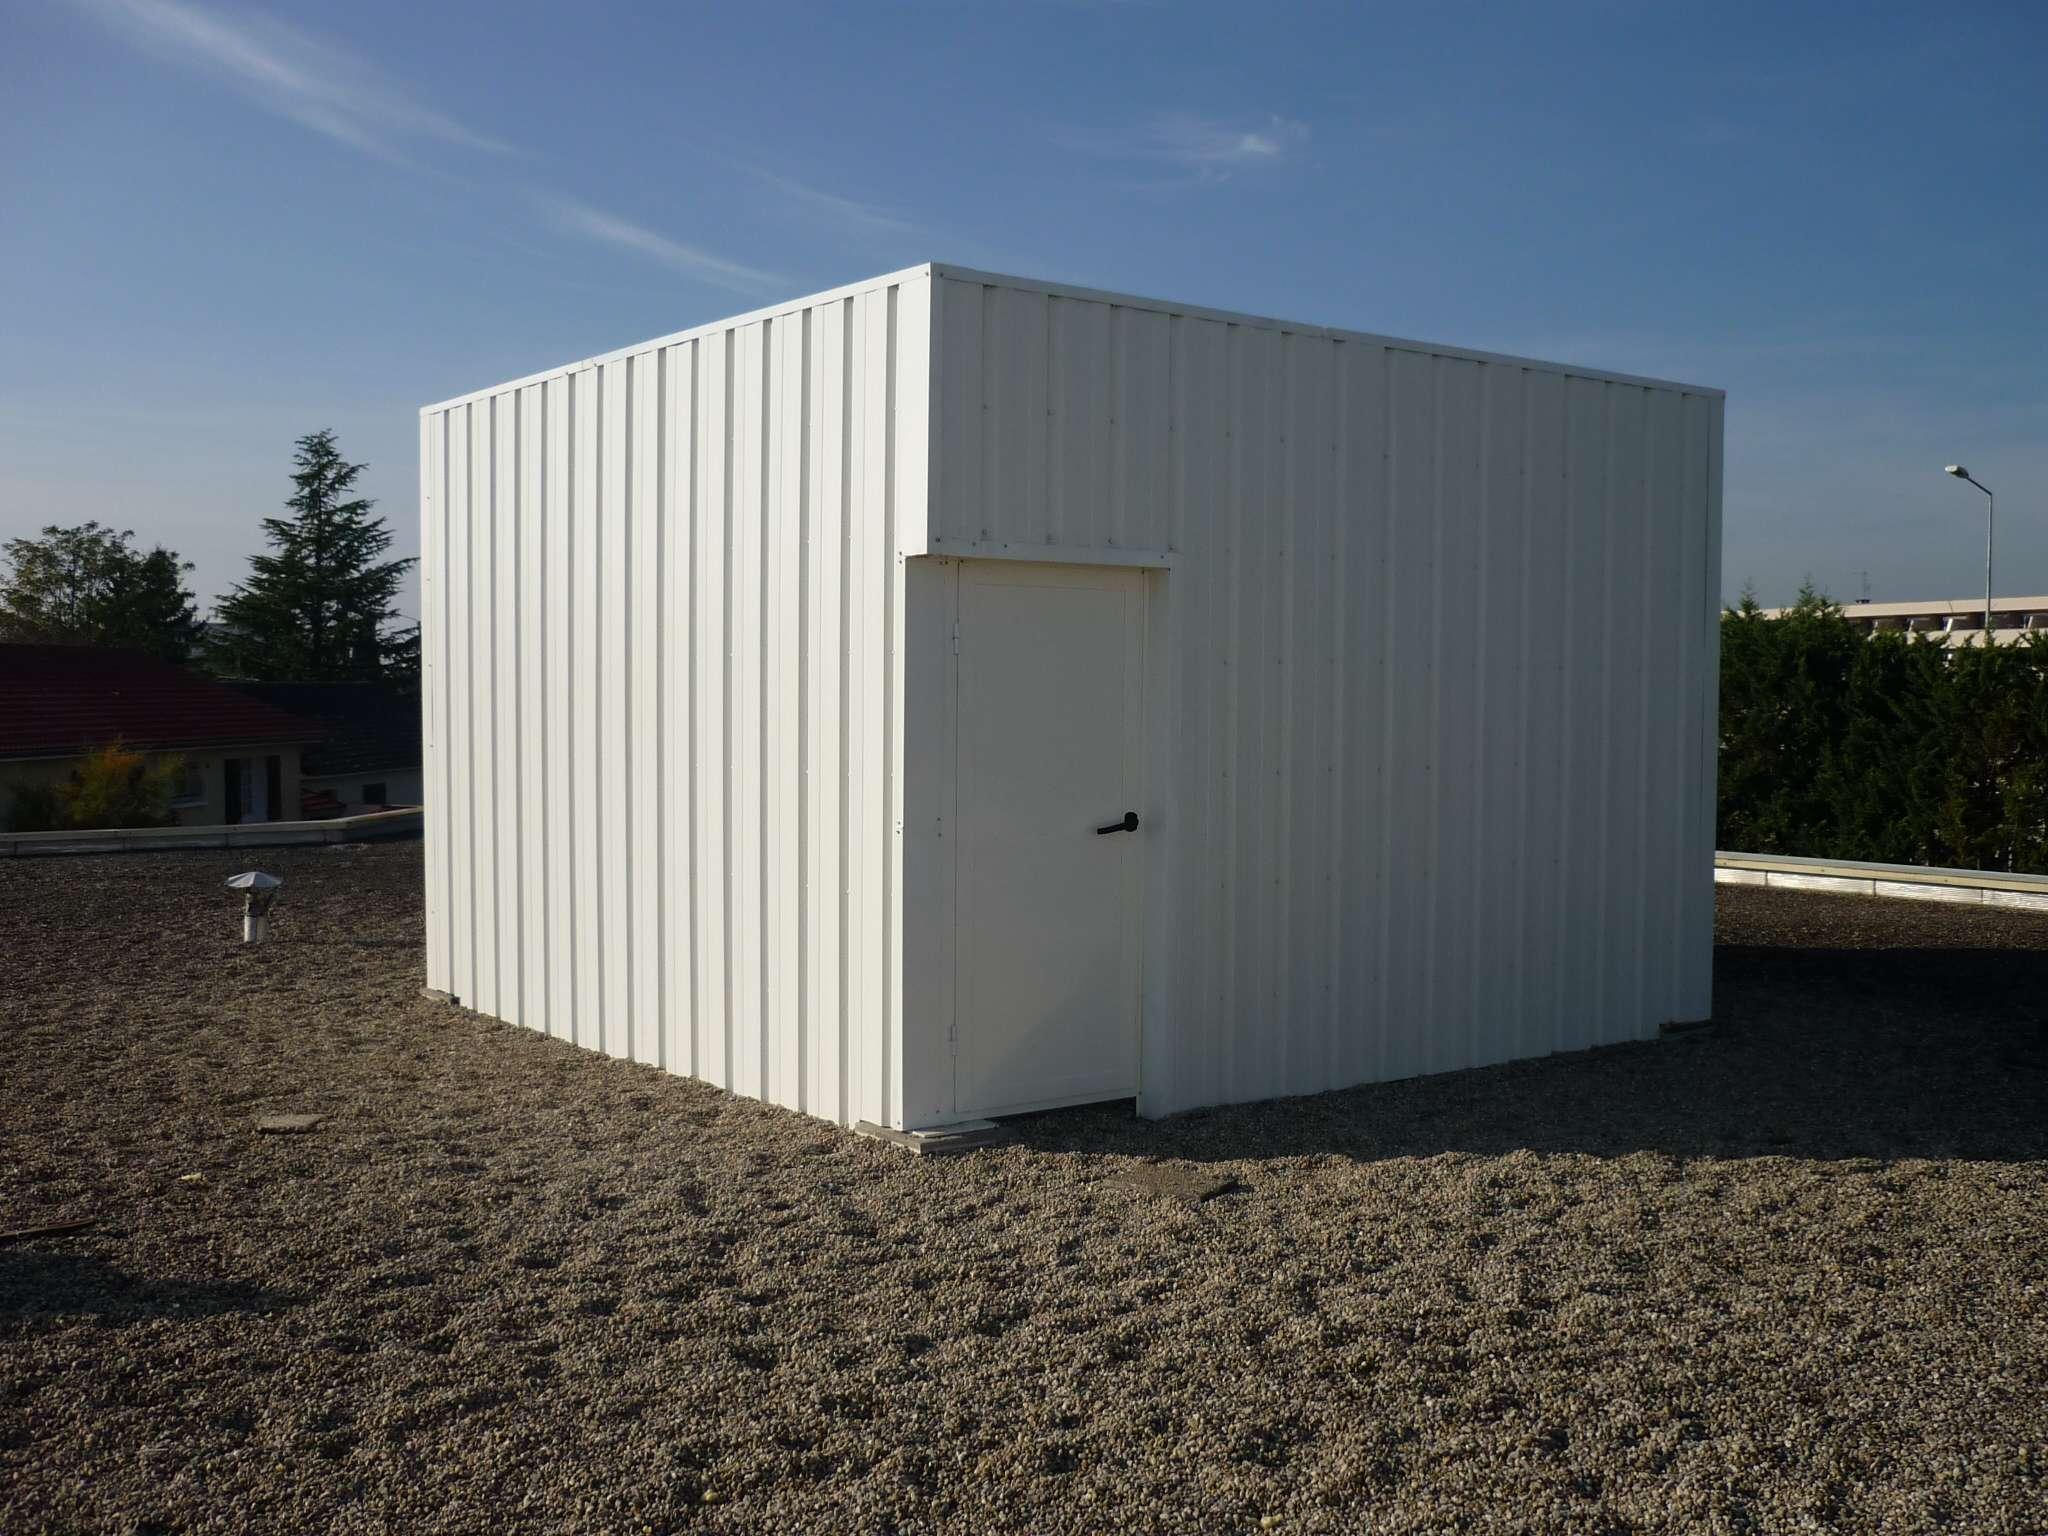 ecran acoustique ventilation cometac. Black Bedroom Furniture Sets. Home Design Ideas